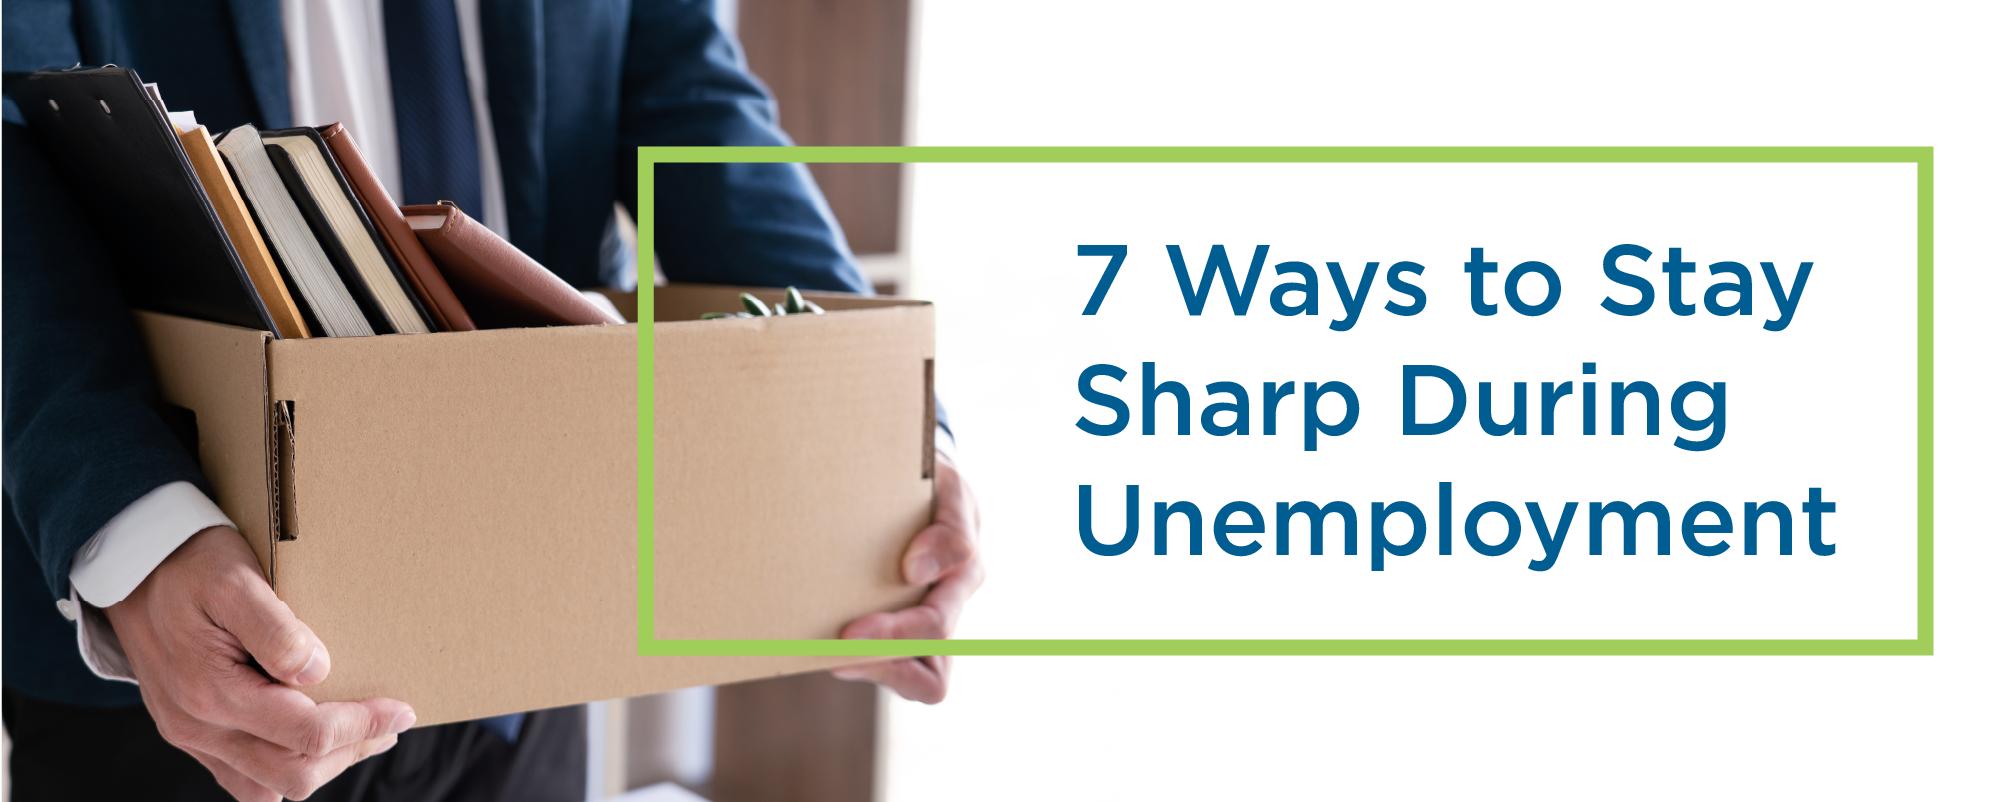 7 ways to stay sharp during unemployment.